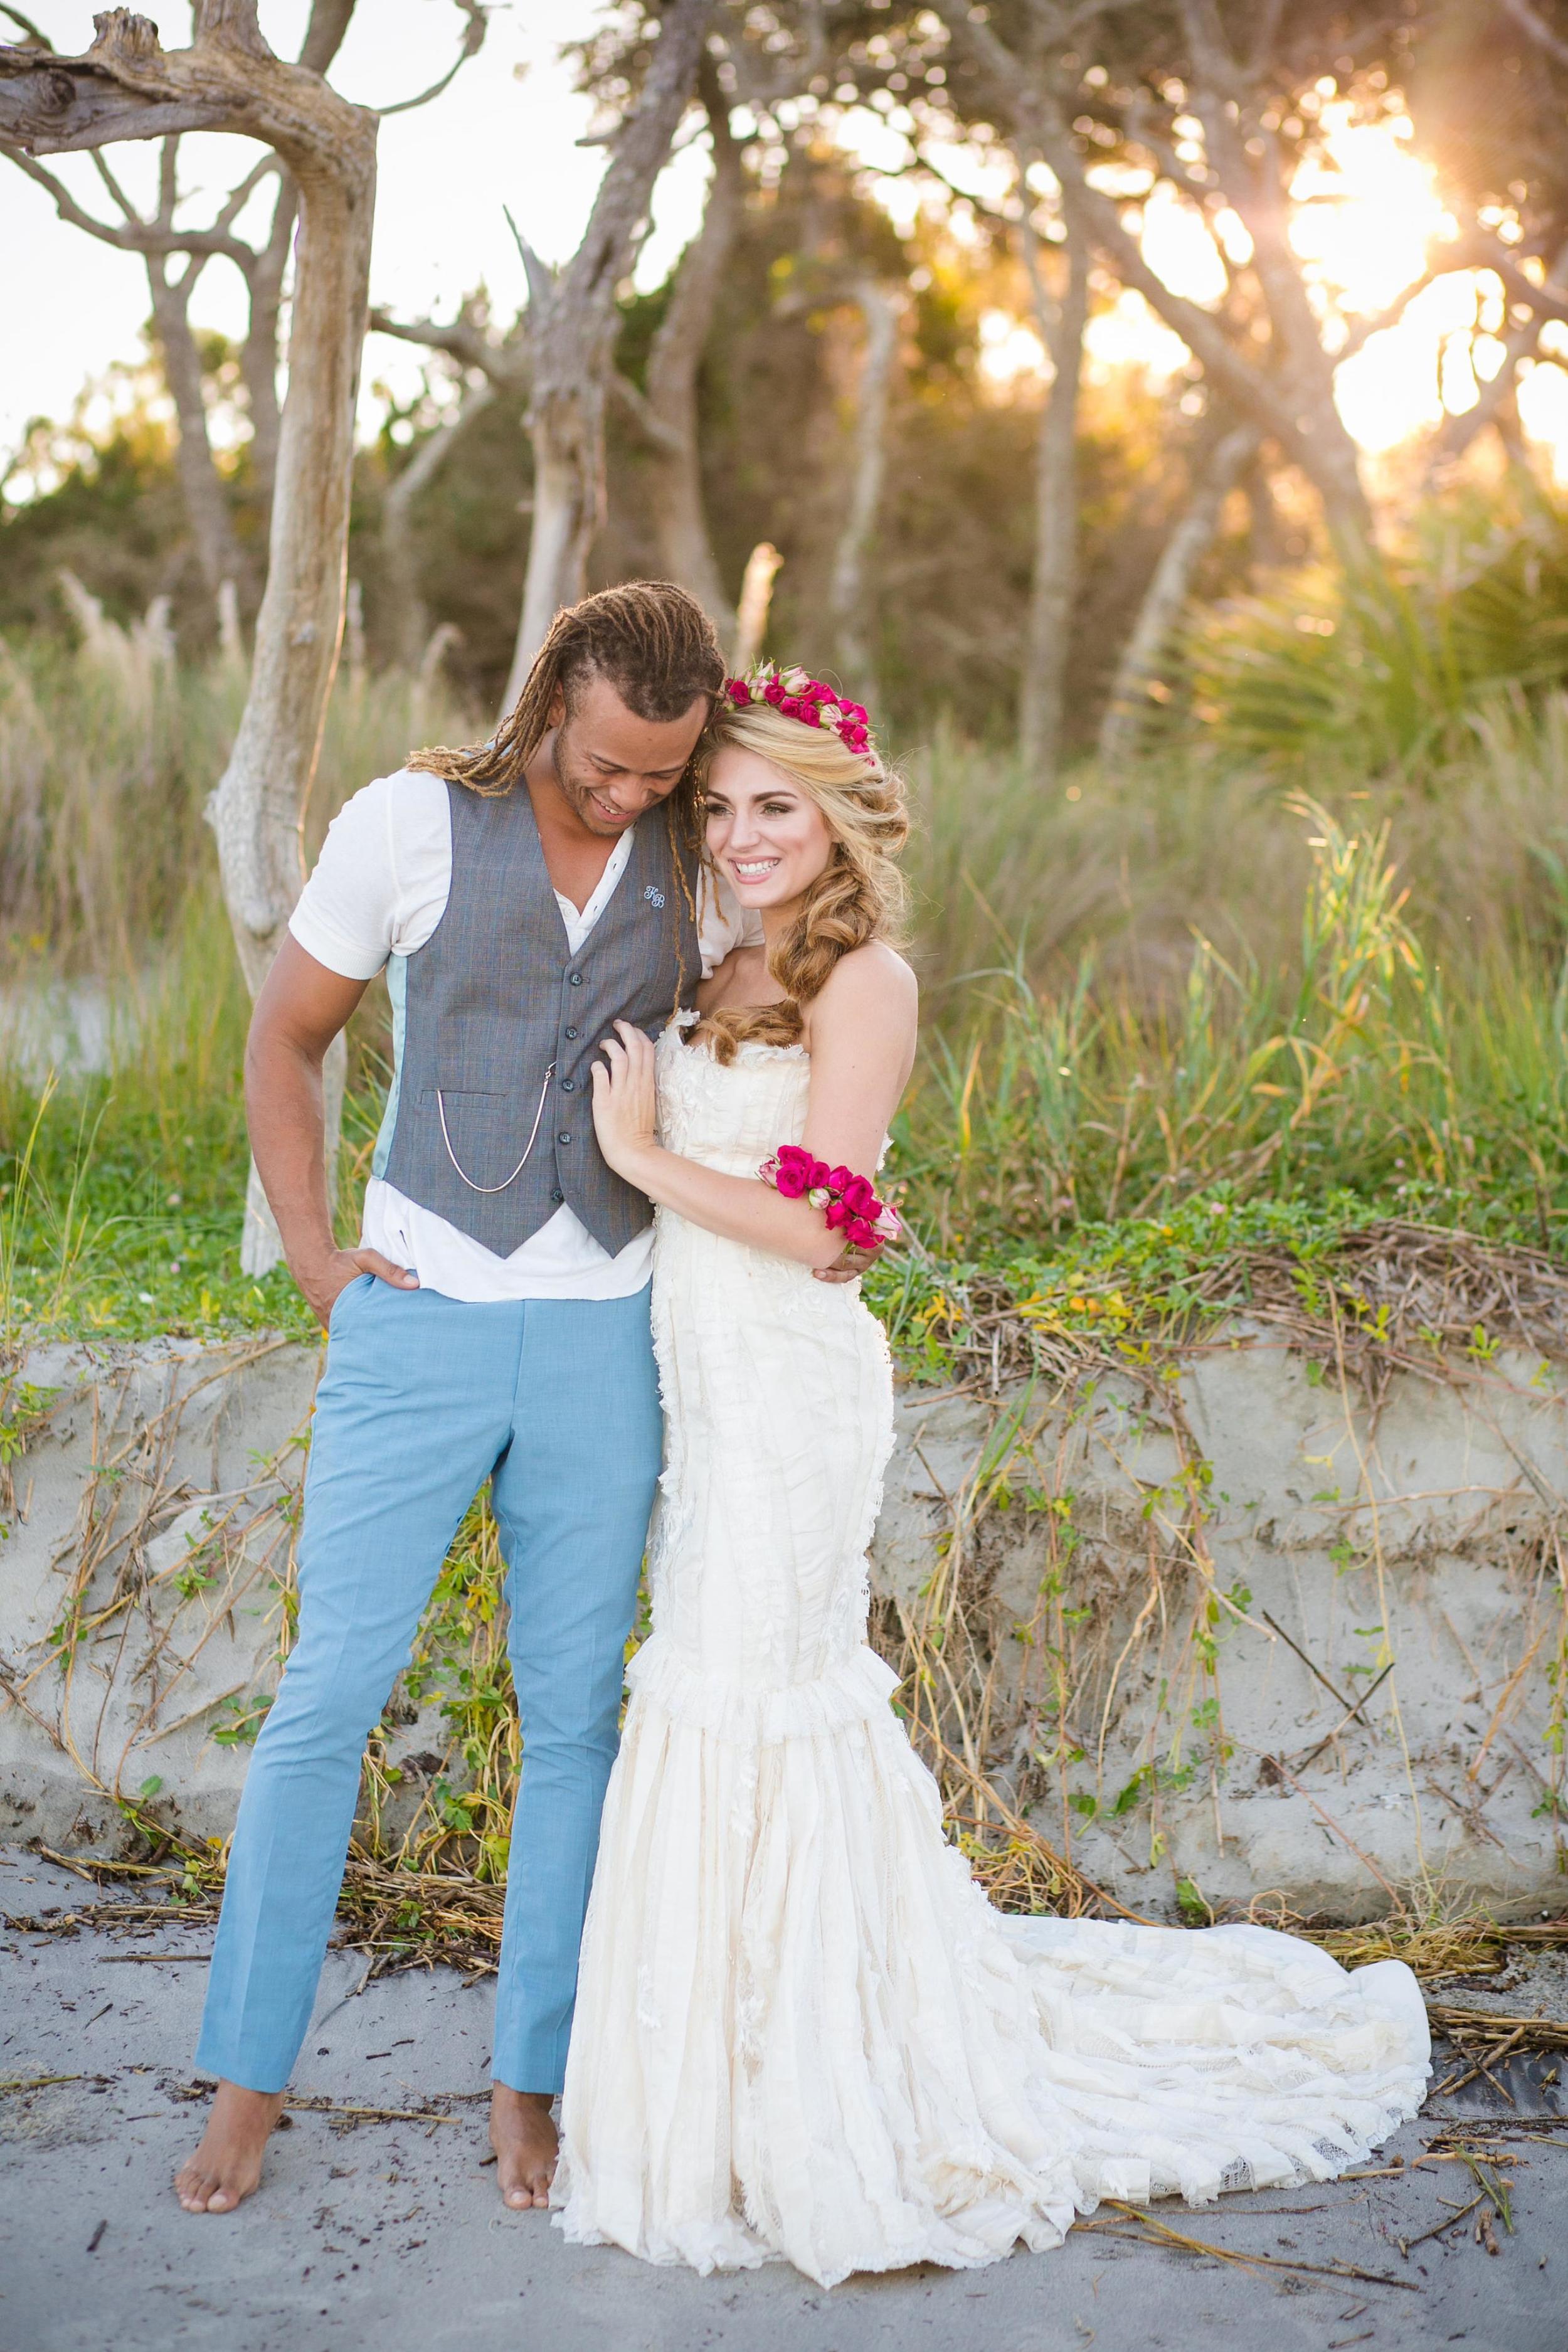 Boneyard Beach wedding inspiration